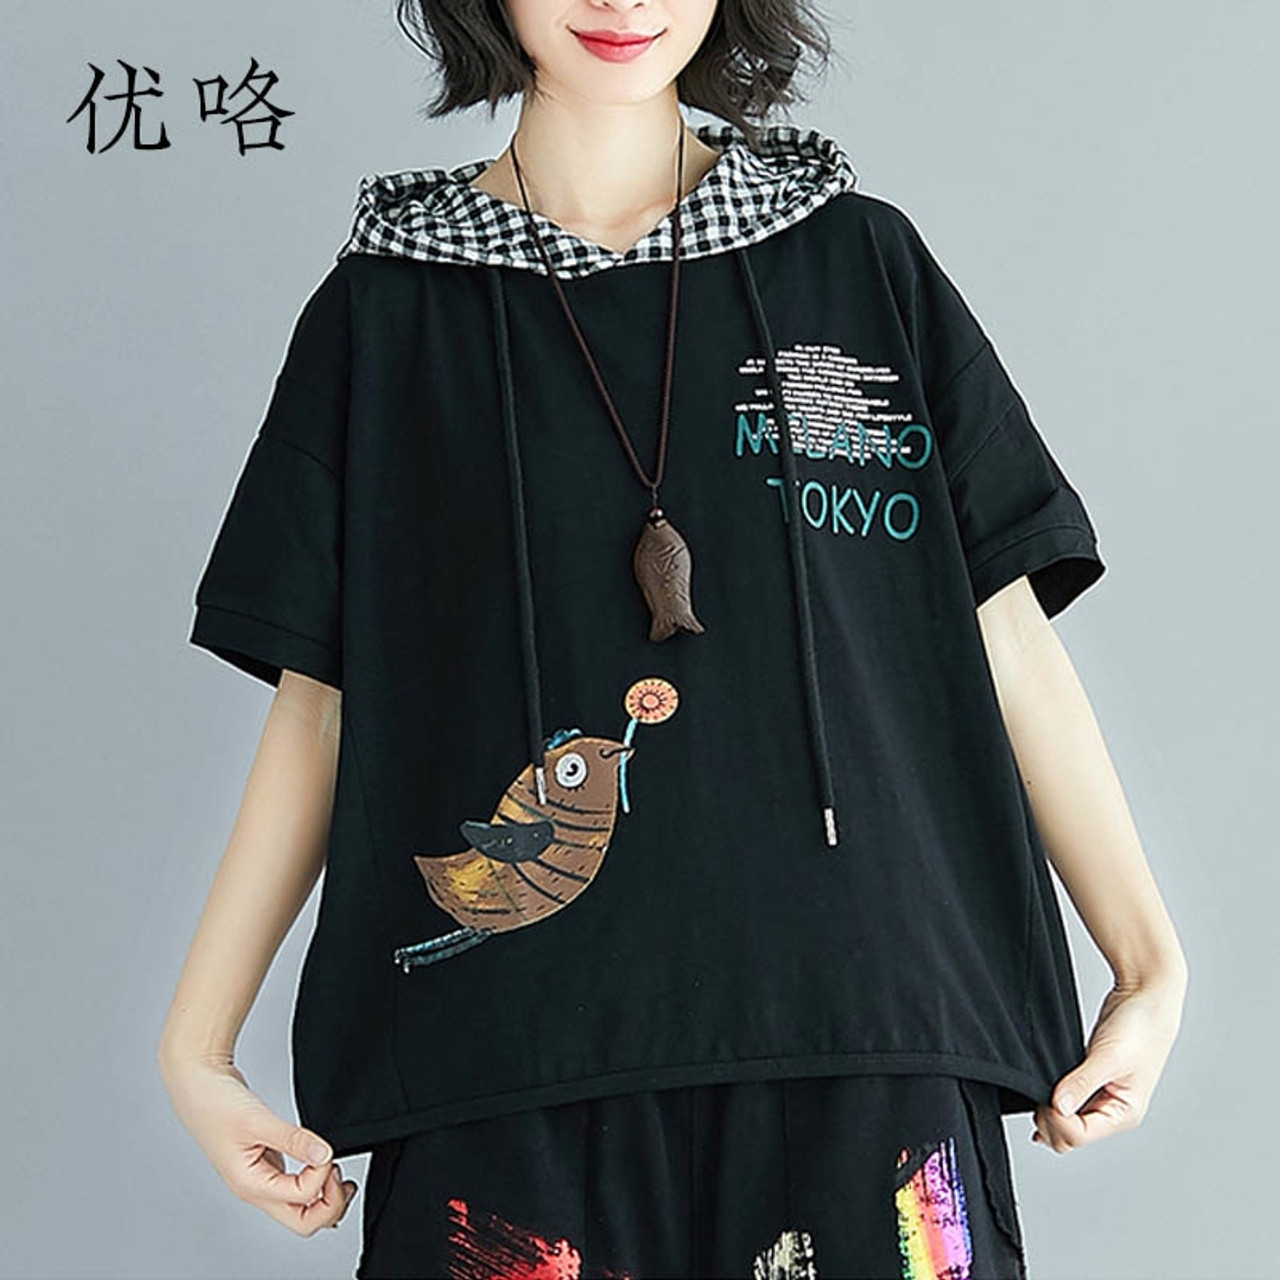 973c157ad0981 2019 Summer Harajuku Hoody T Shirt Women Plus Size Kawaii Bird Printed  Cotton T Shirt Femme Casual Loose Tee Shirts 4XL 5XL 6XL